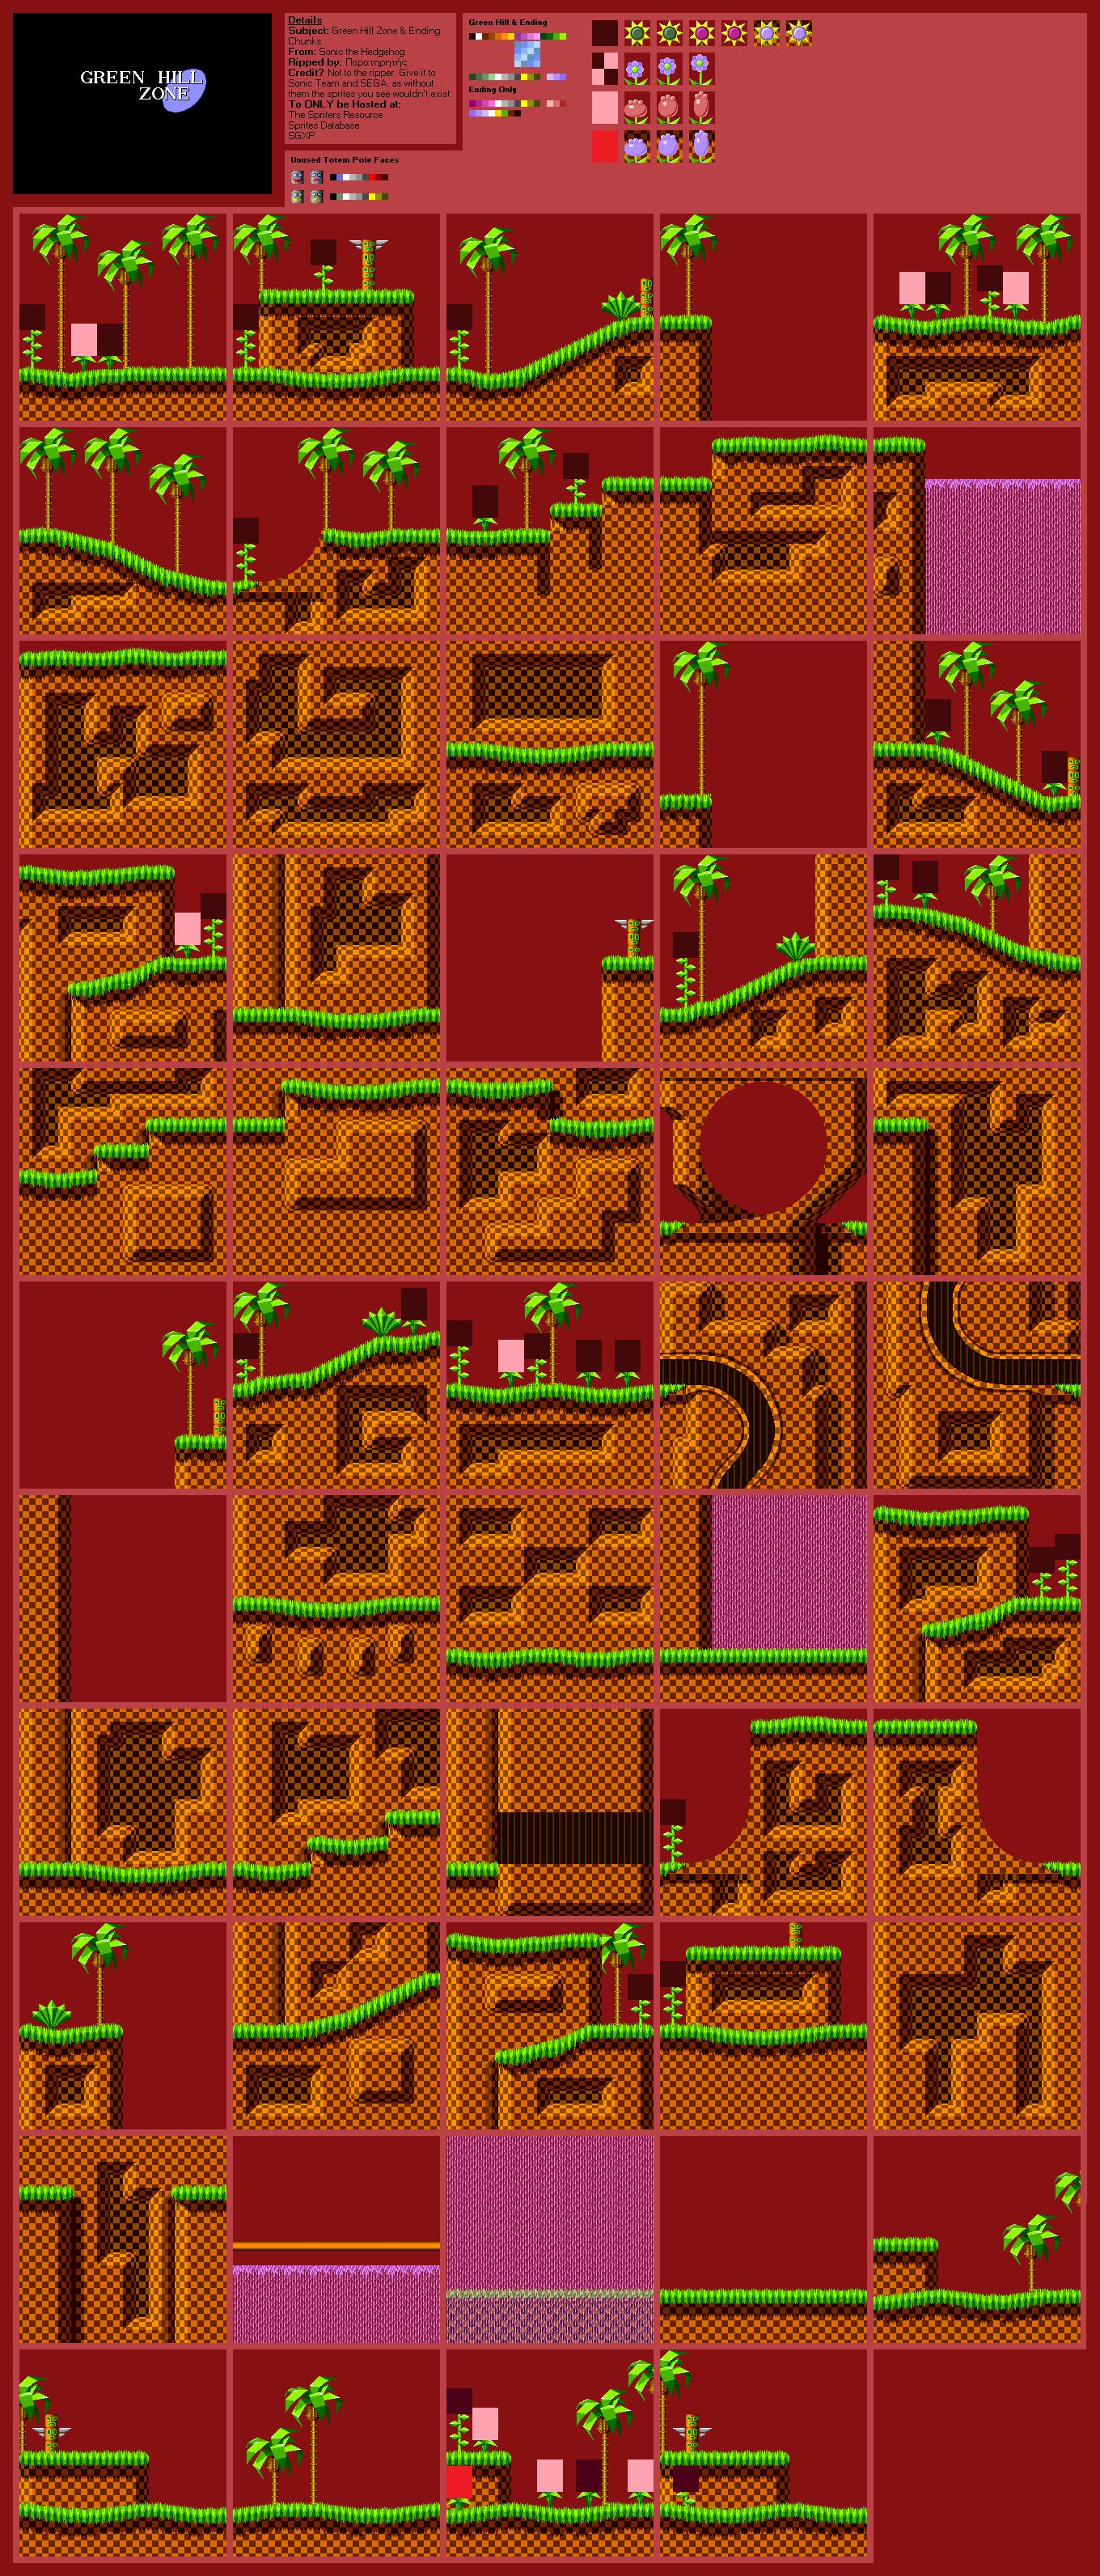 Genesis / 32X / SCD - Sonic the Hedgehog - Green Hill Zone